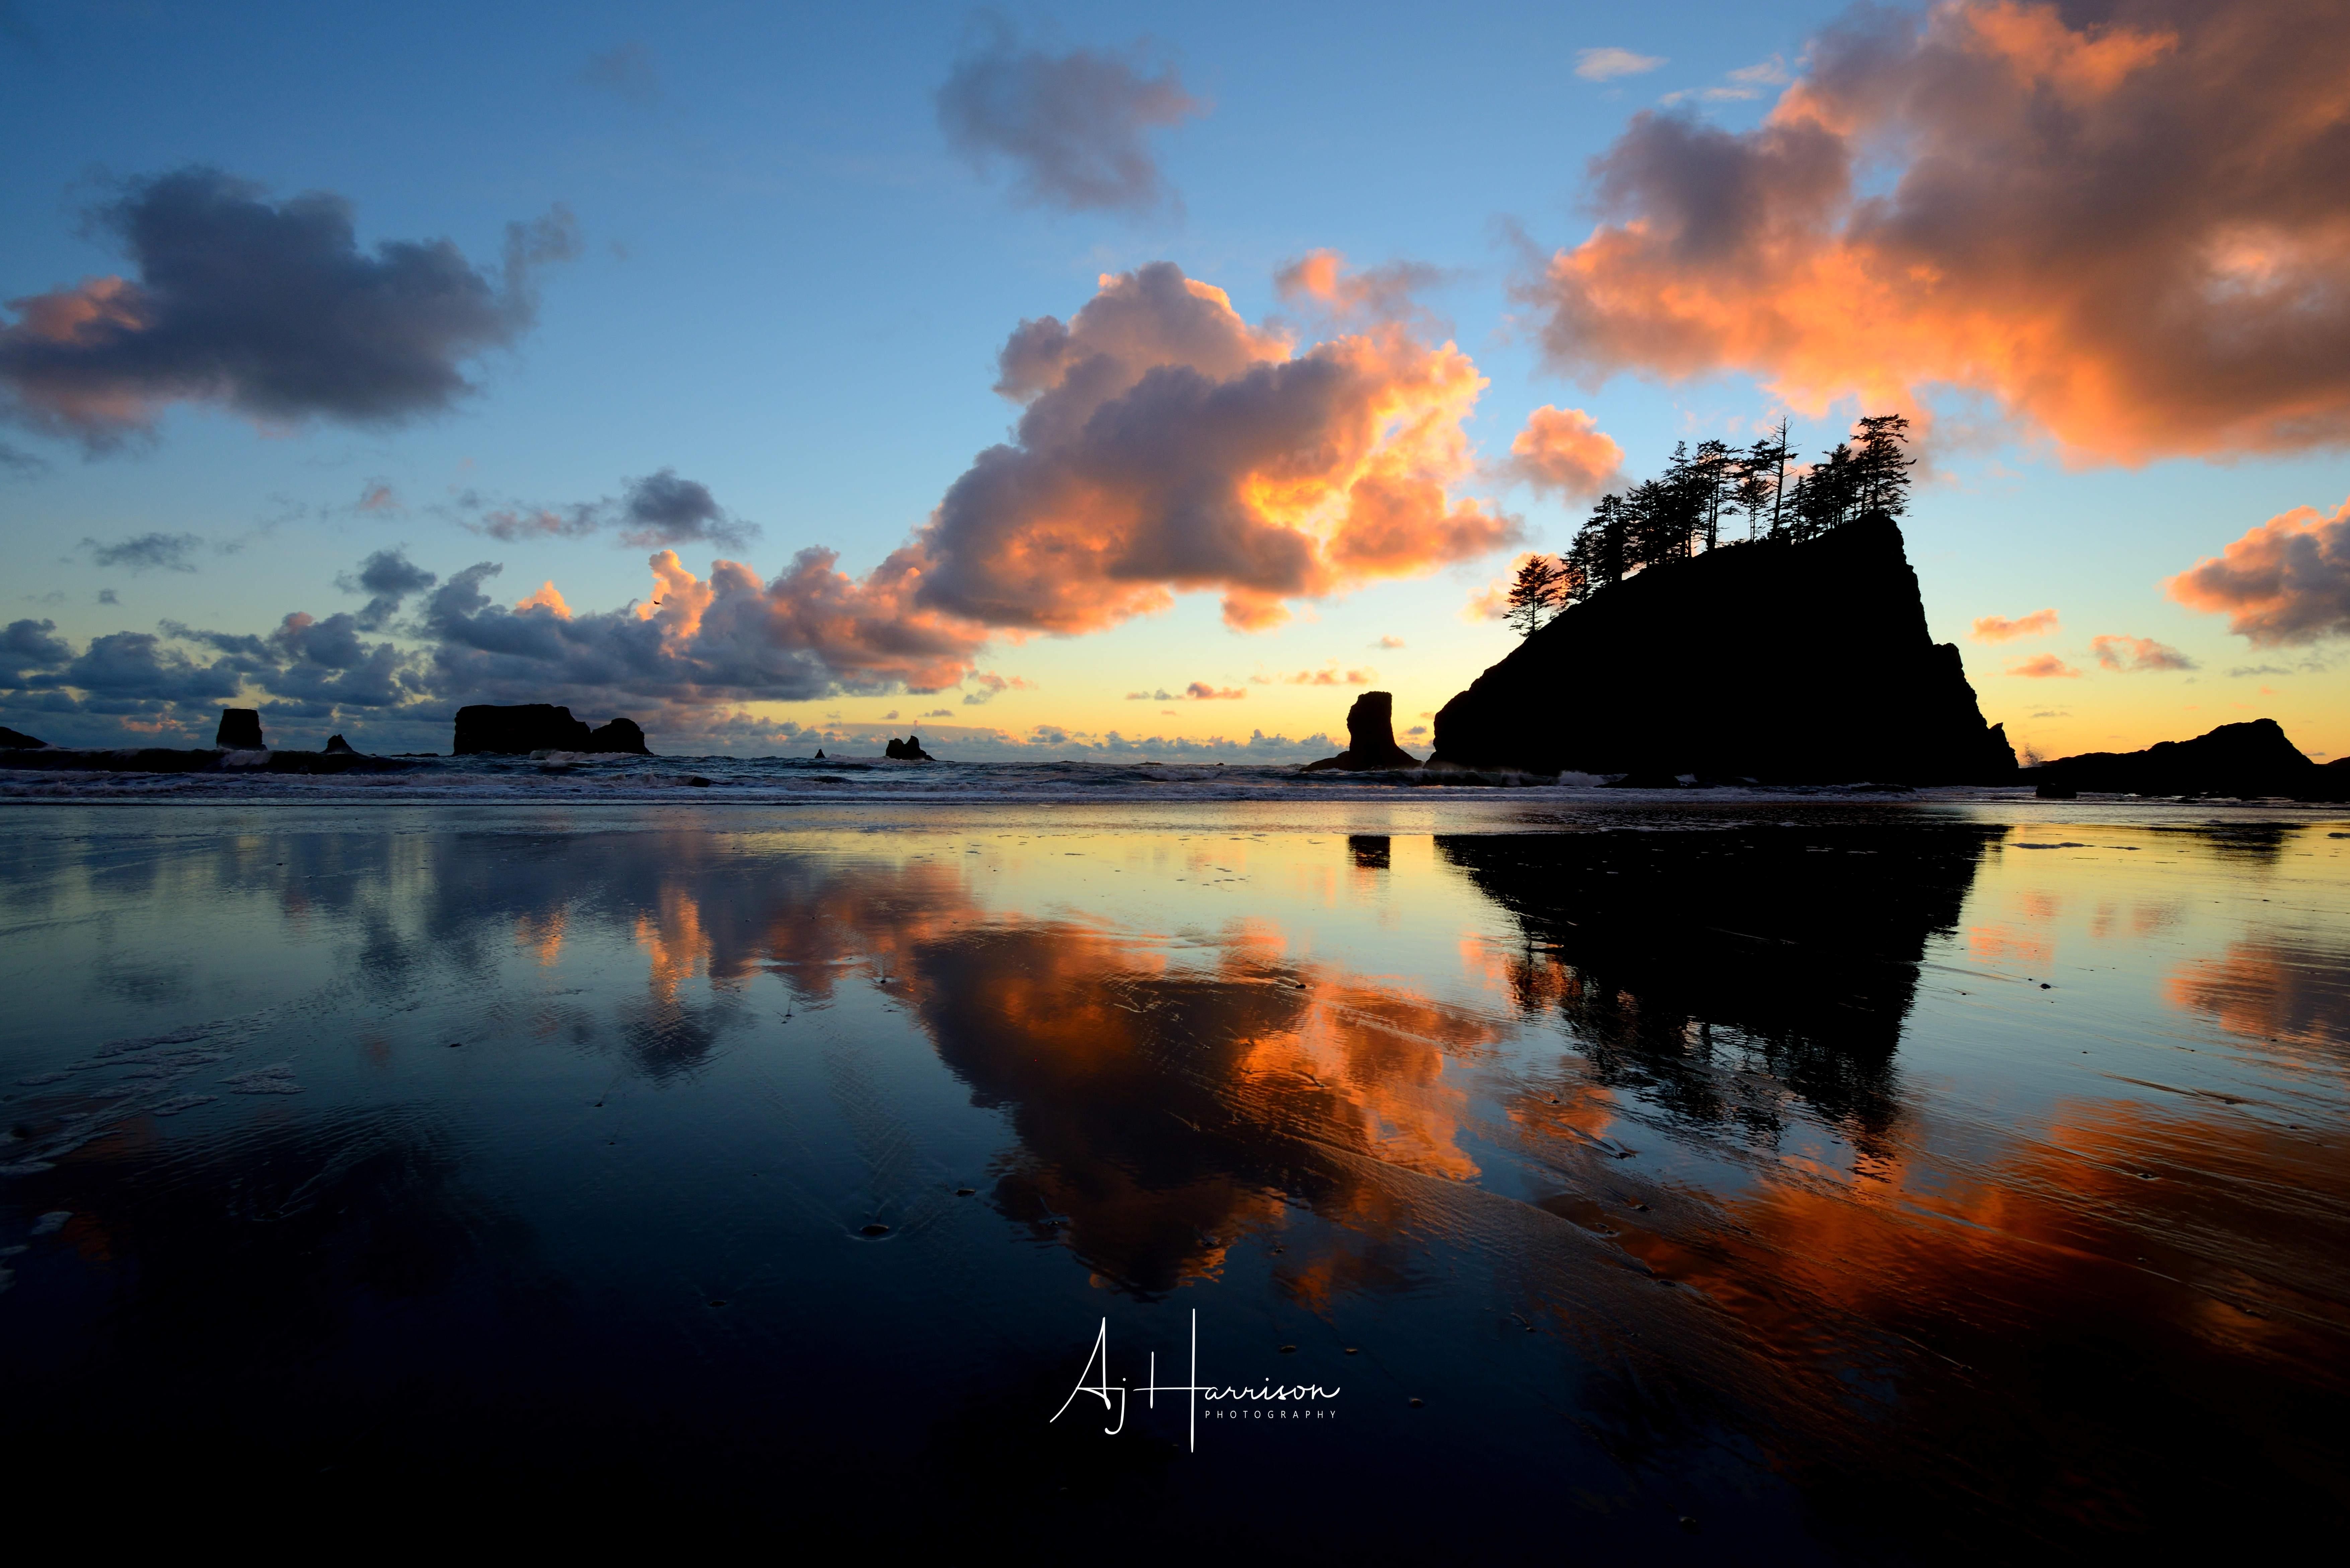 5 QUICK LANDSCAPE PHOTOGRAPHY TIPS